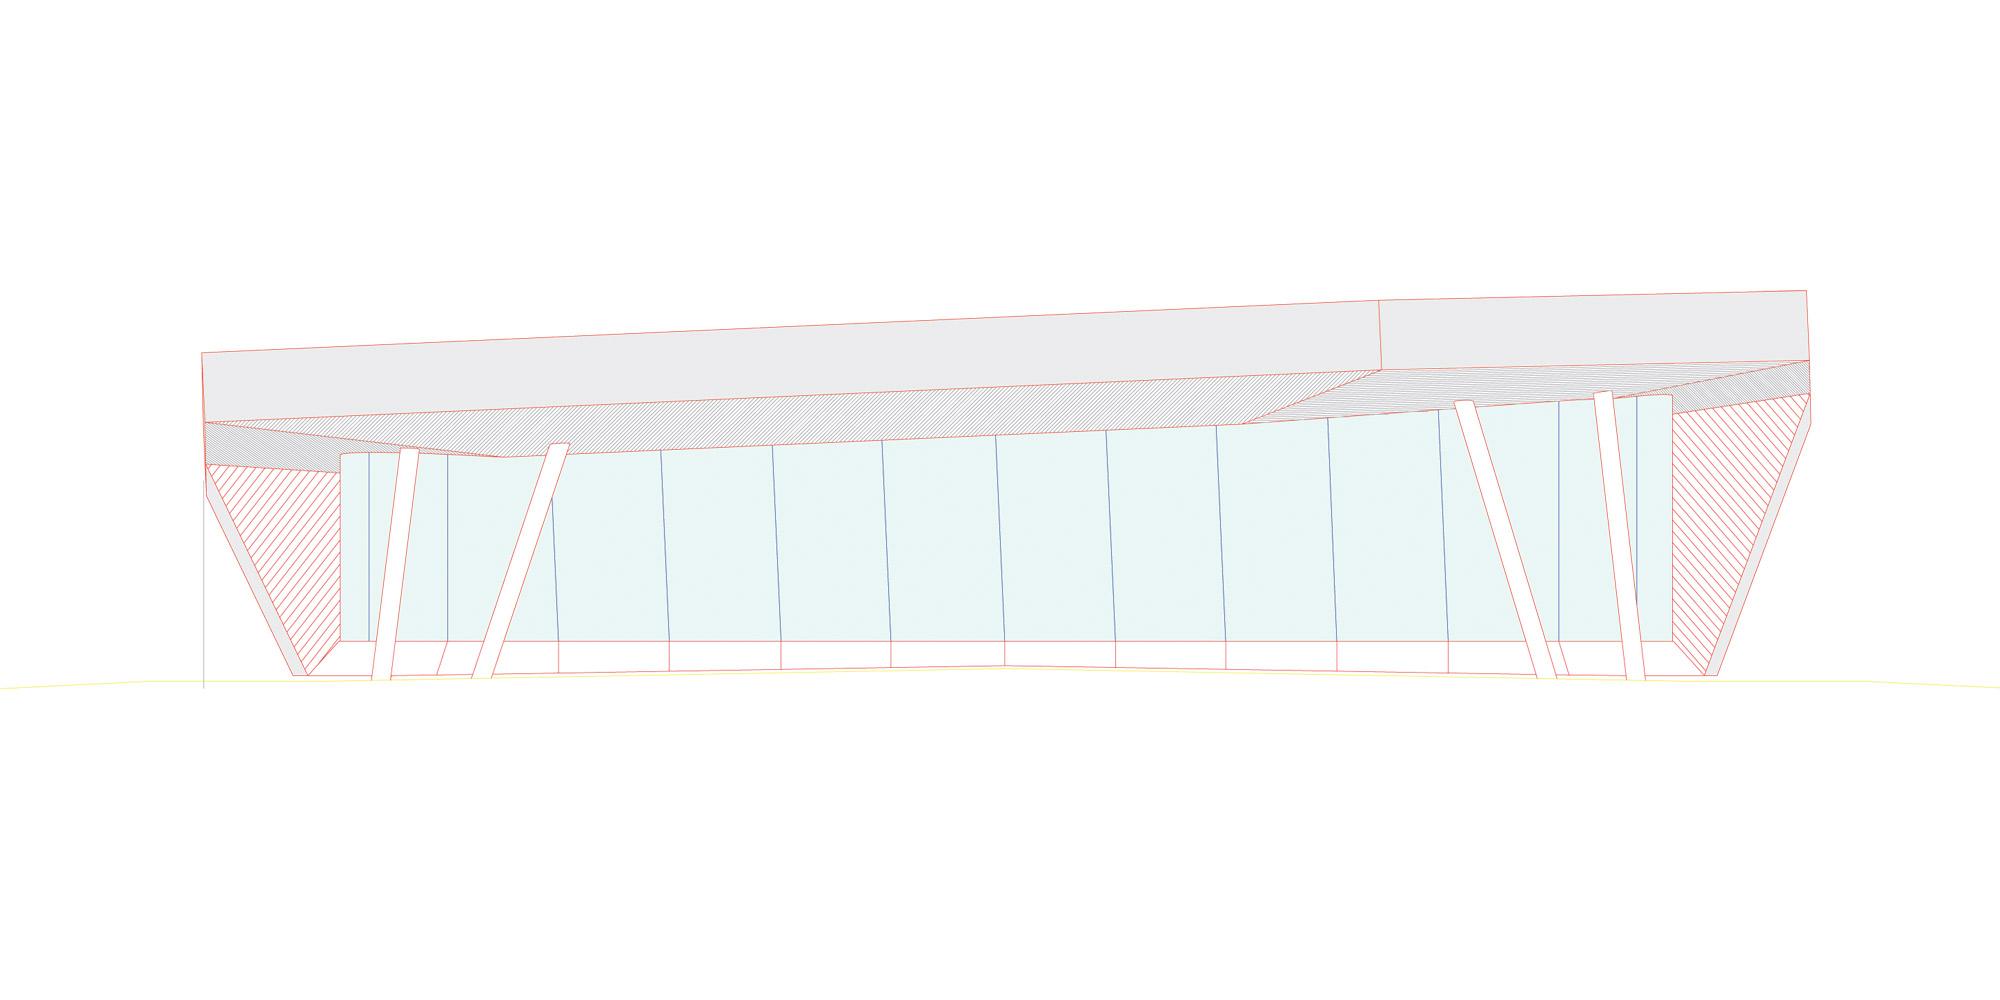 South elevation © Studio Seilern Architects